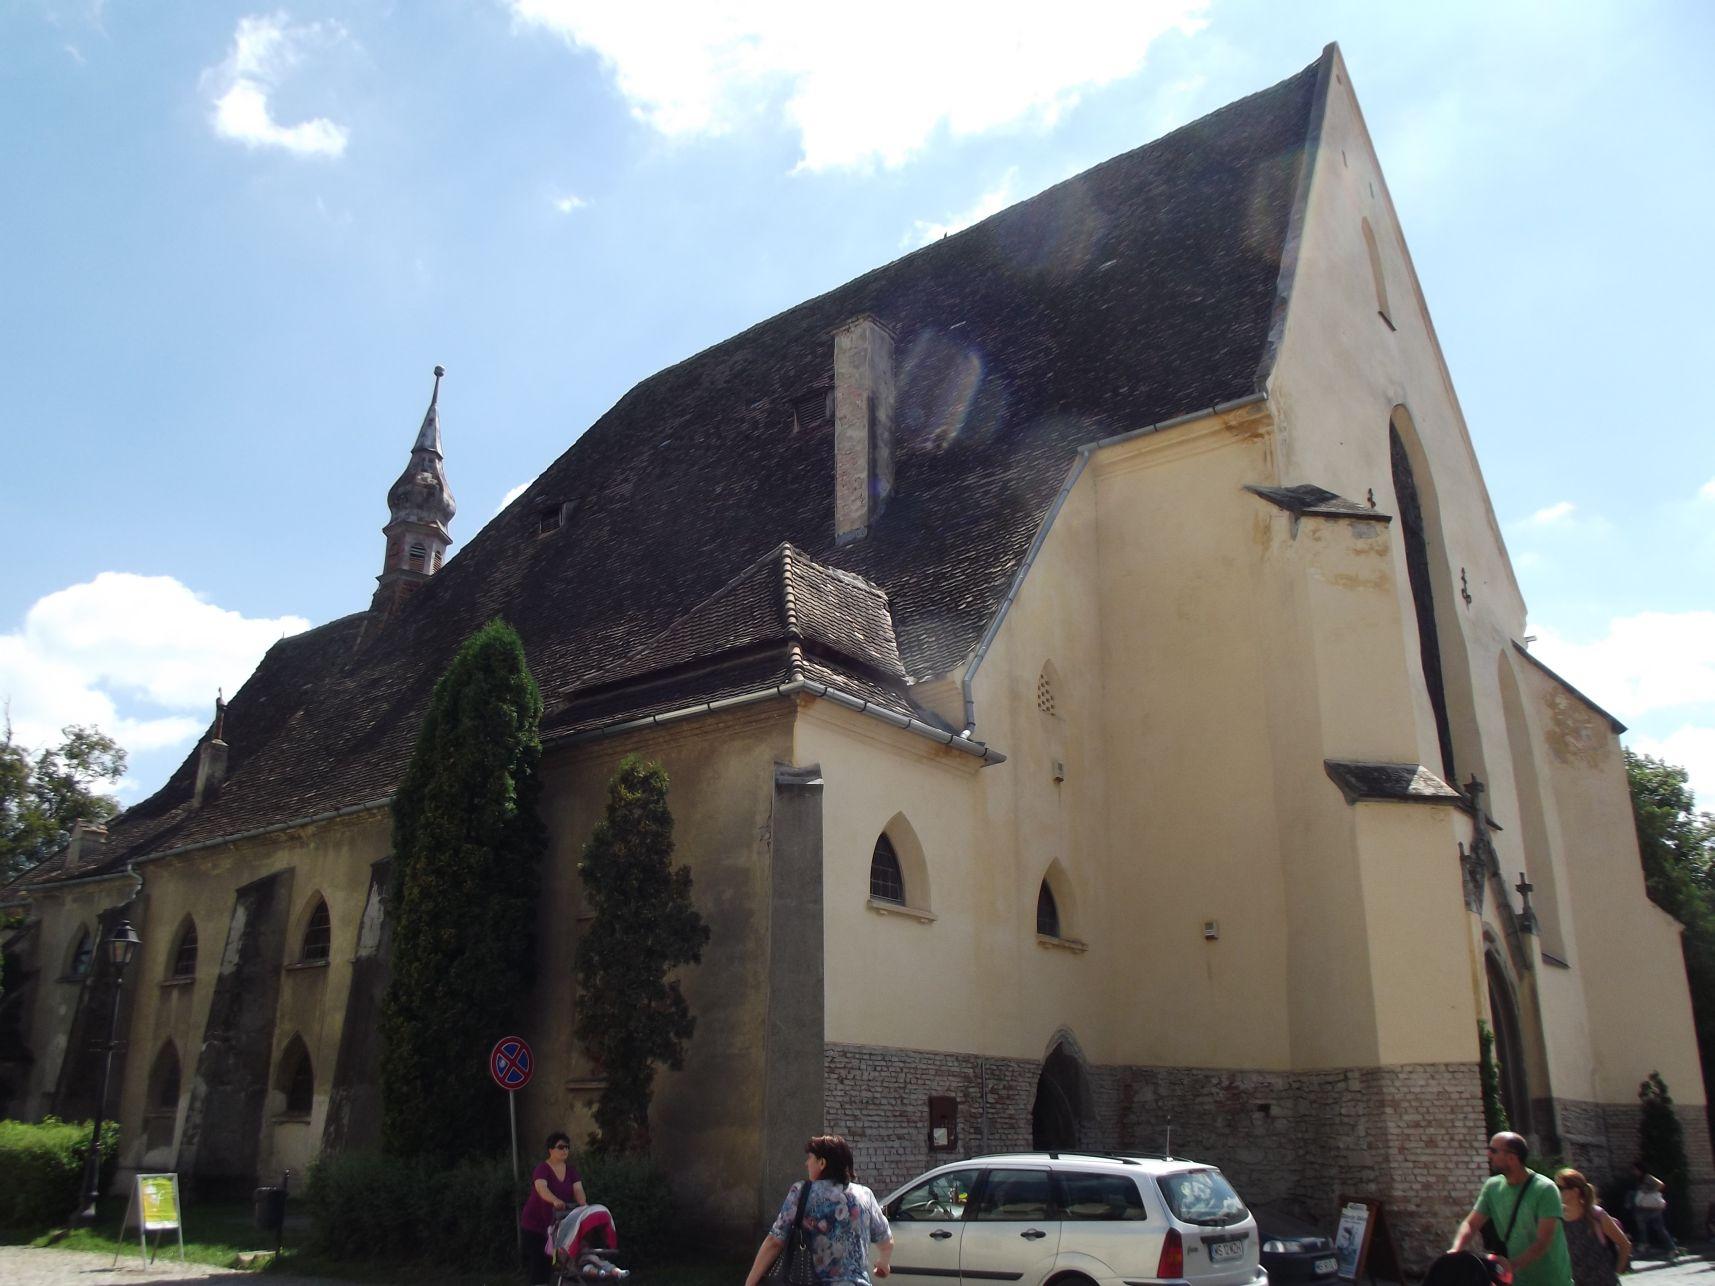 Kolostor templom